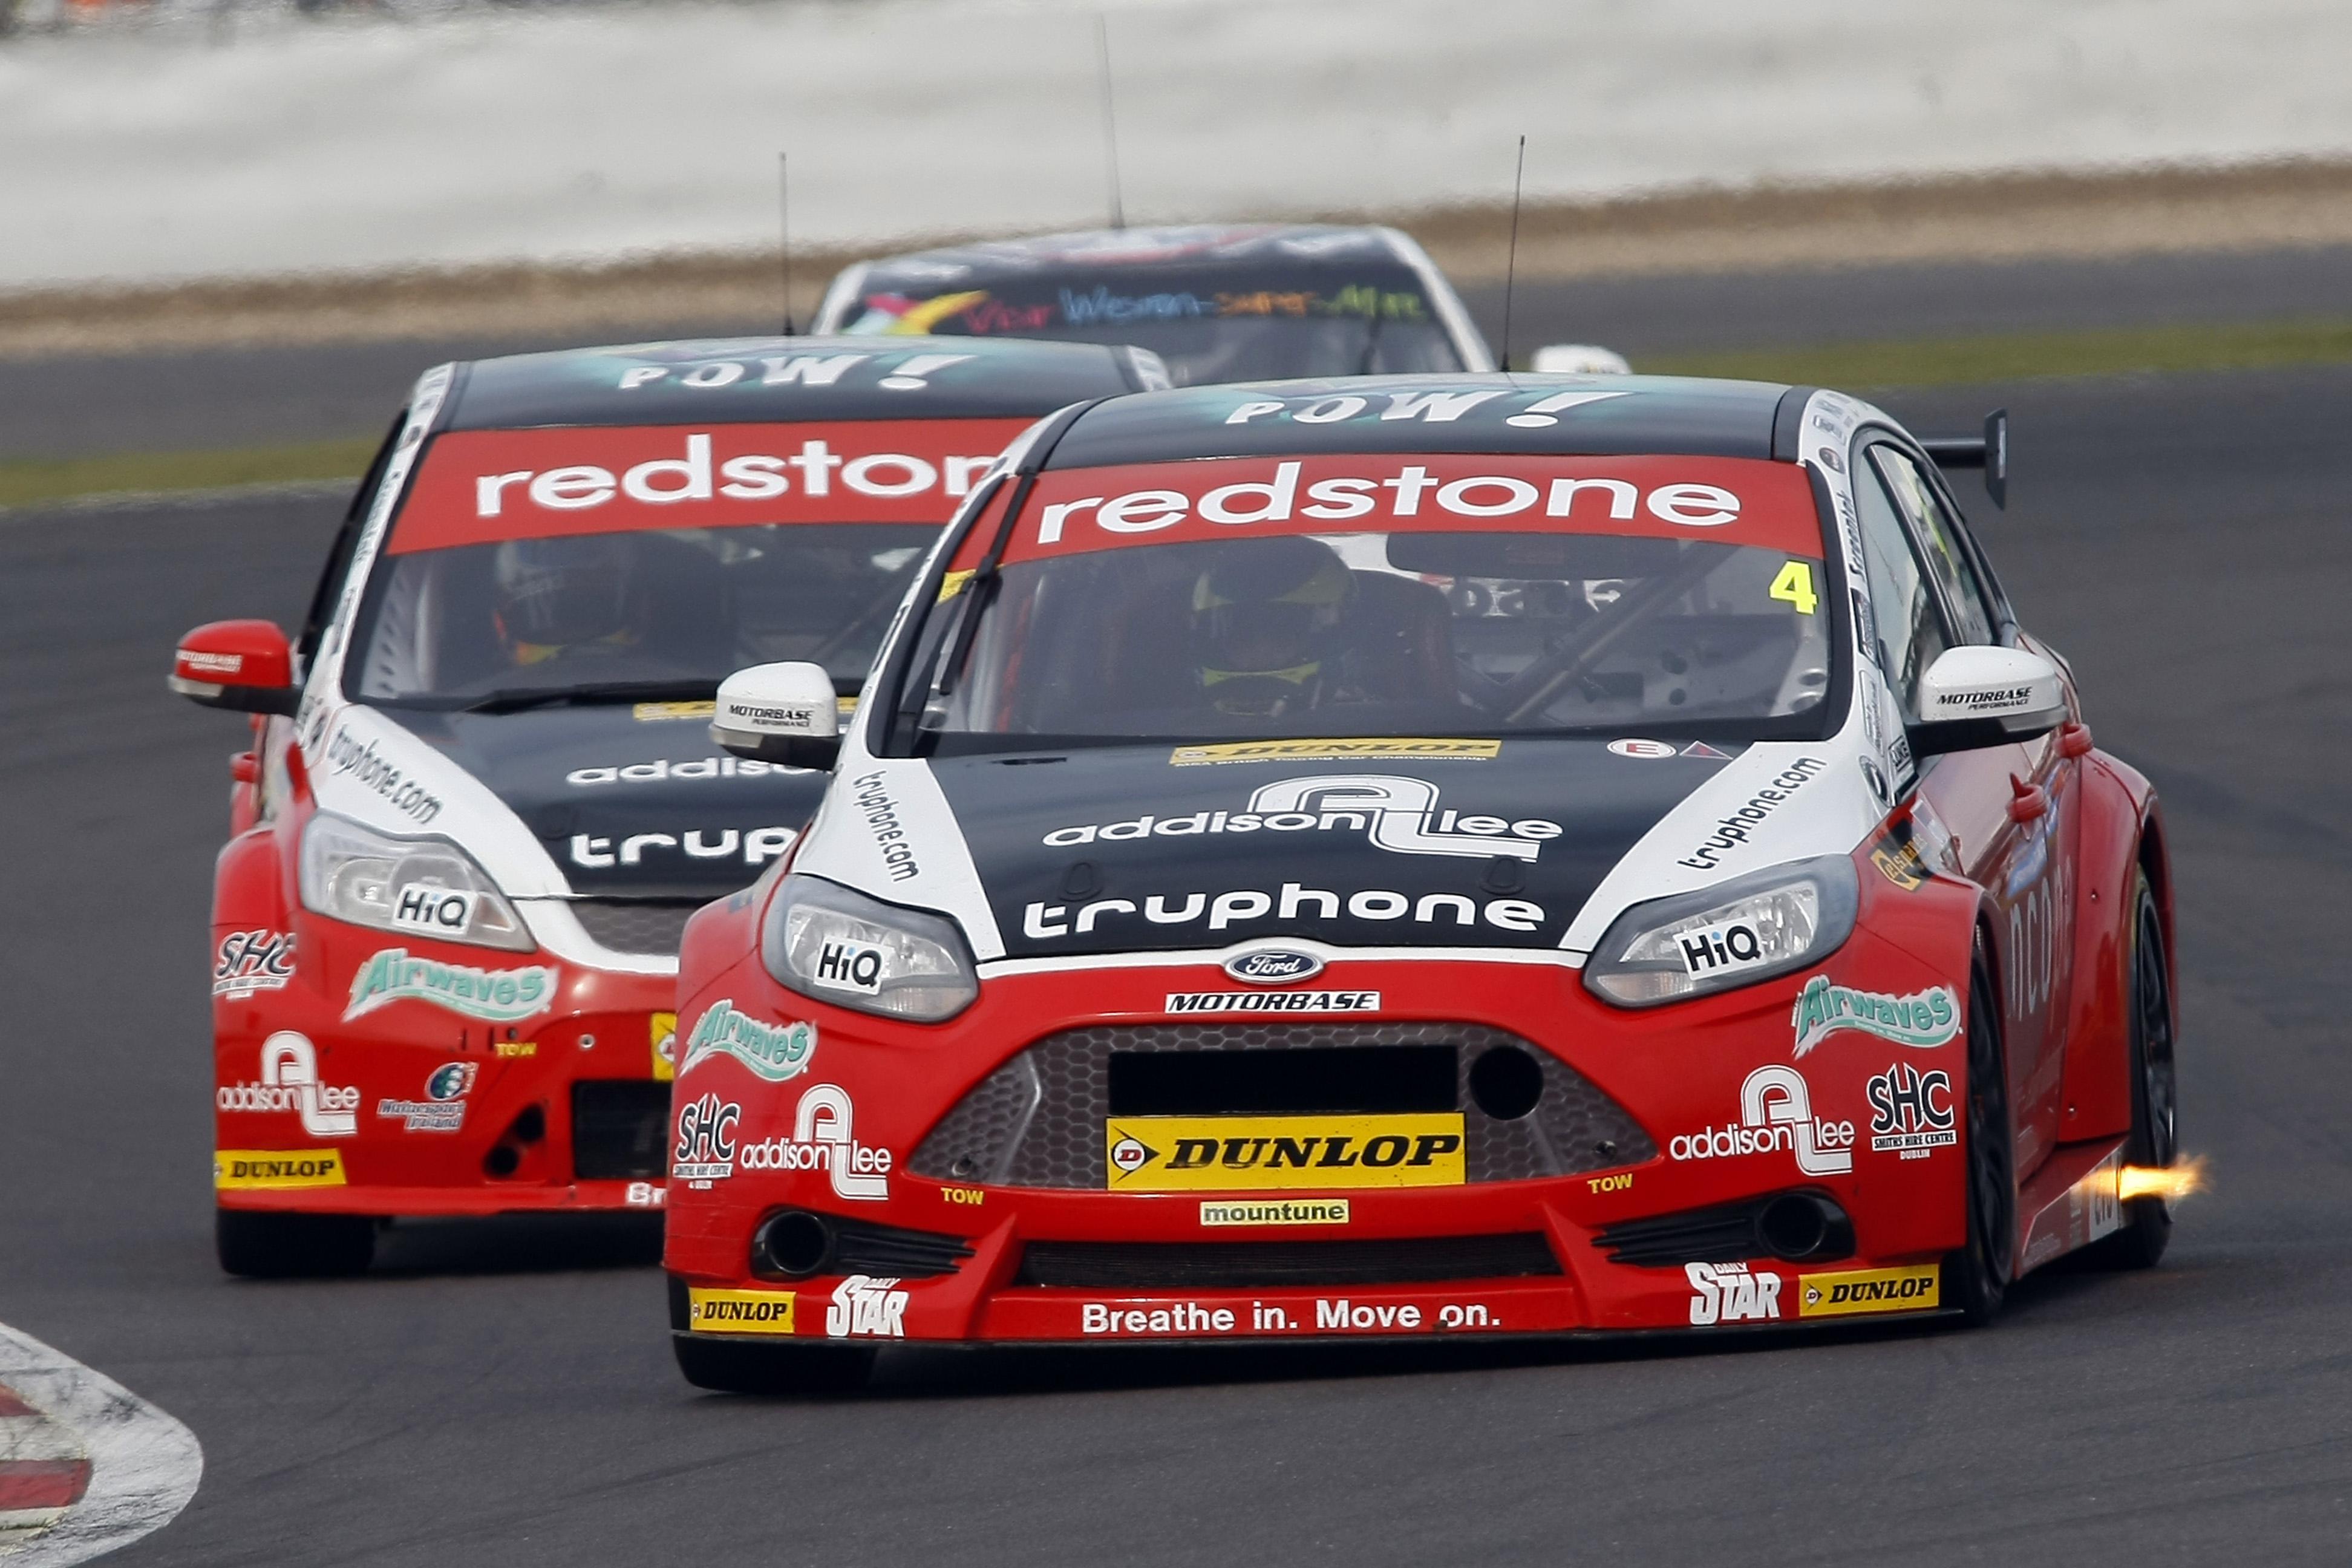 Focus Race Car in the UK